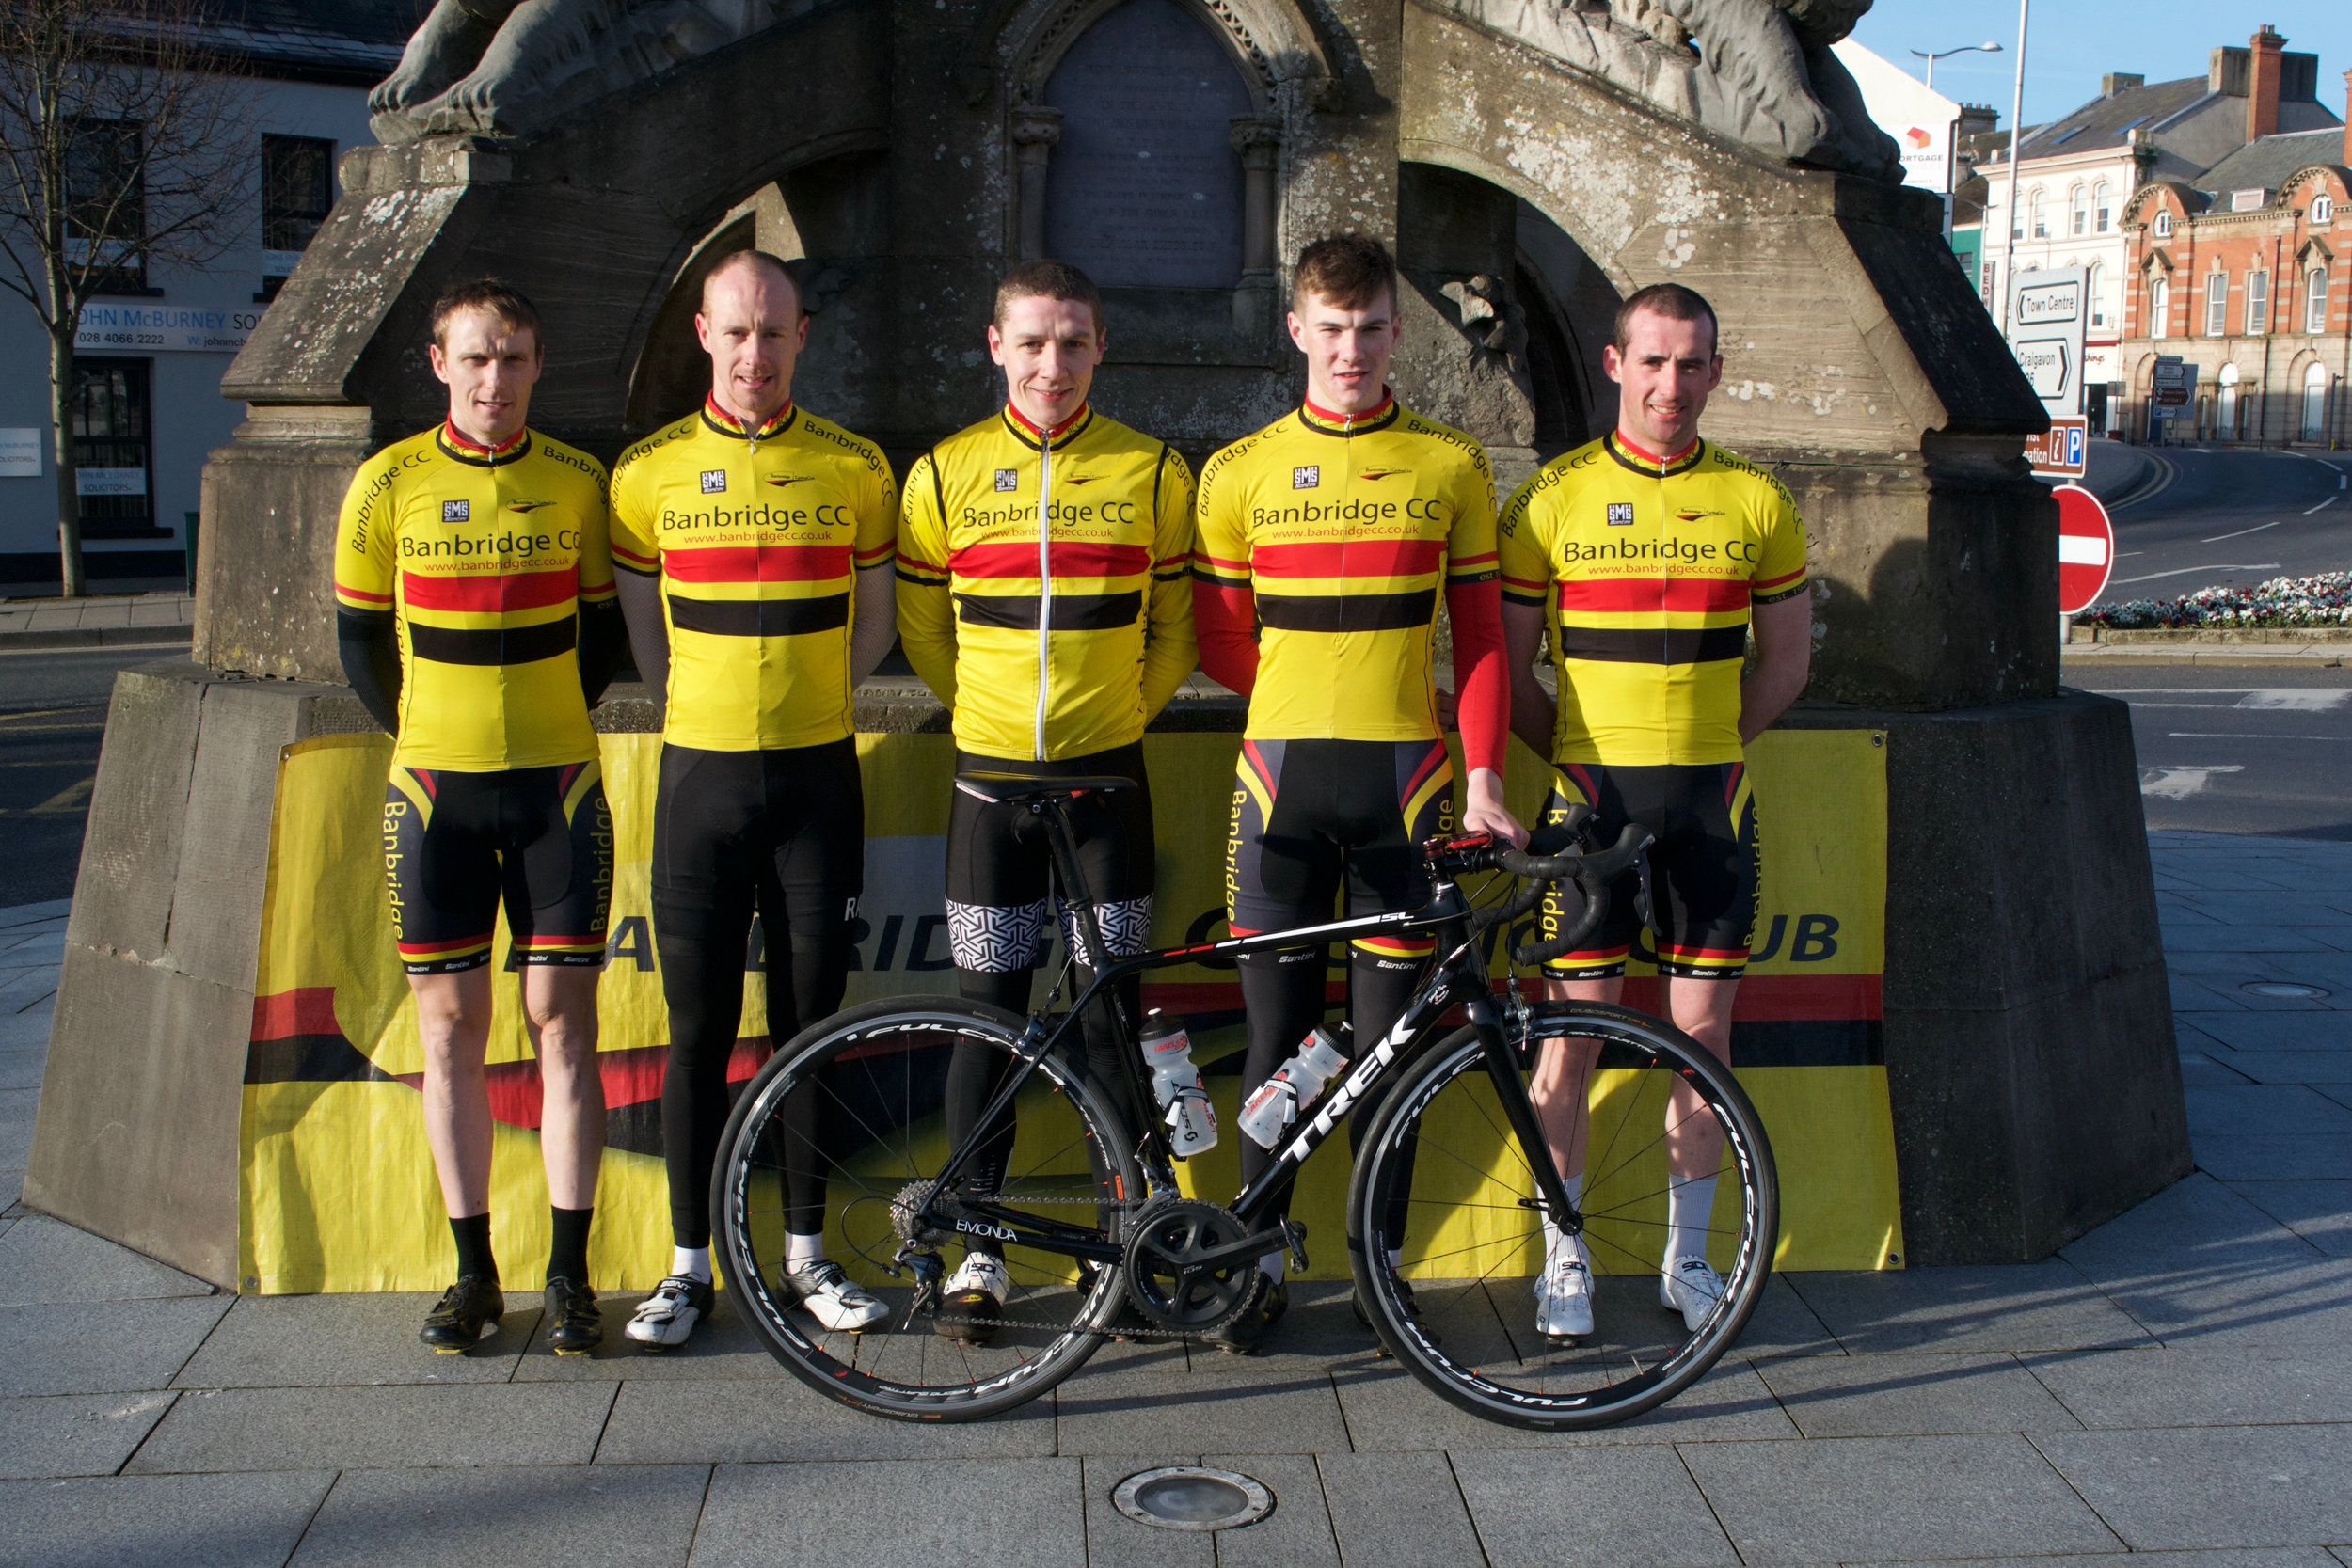 The 2017 Banbridge CC Tour of the North Team; (L-R) Gareth McKee, Roger Aiken, Sean Downey, John Buller & Matthew Adair.